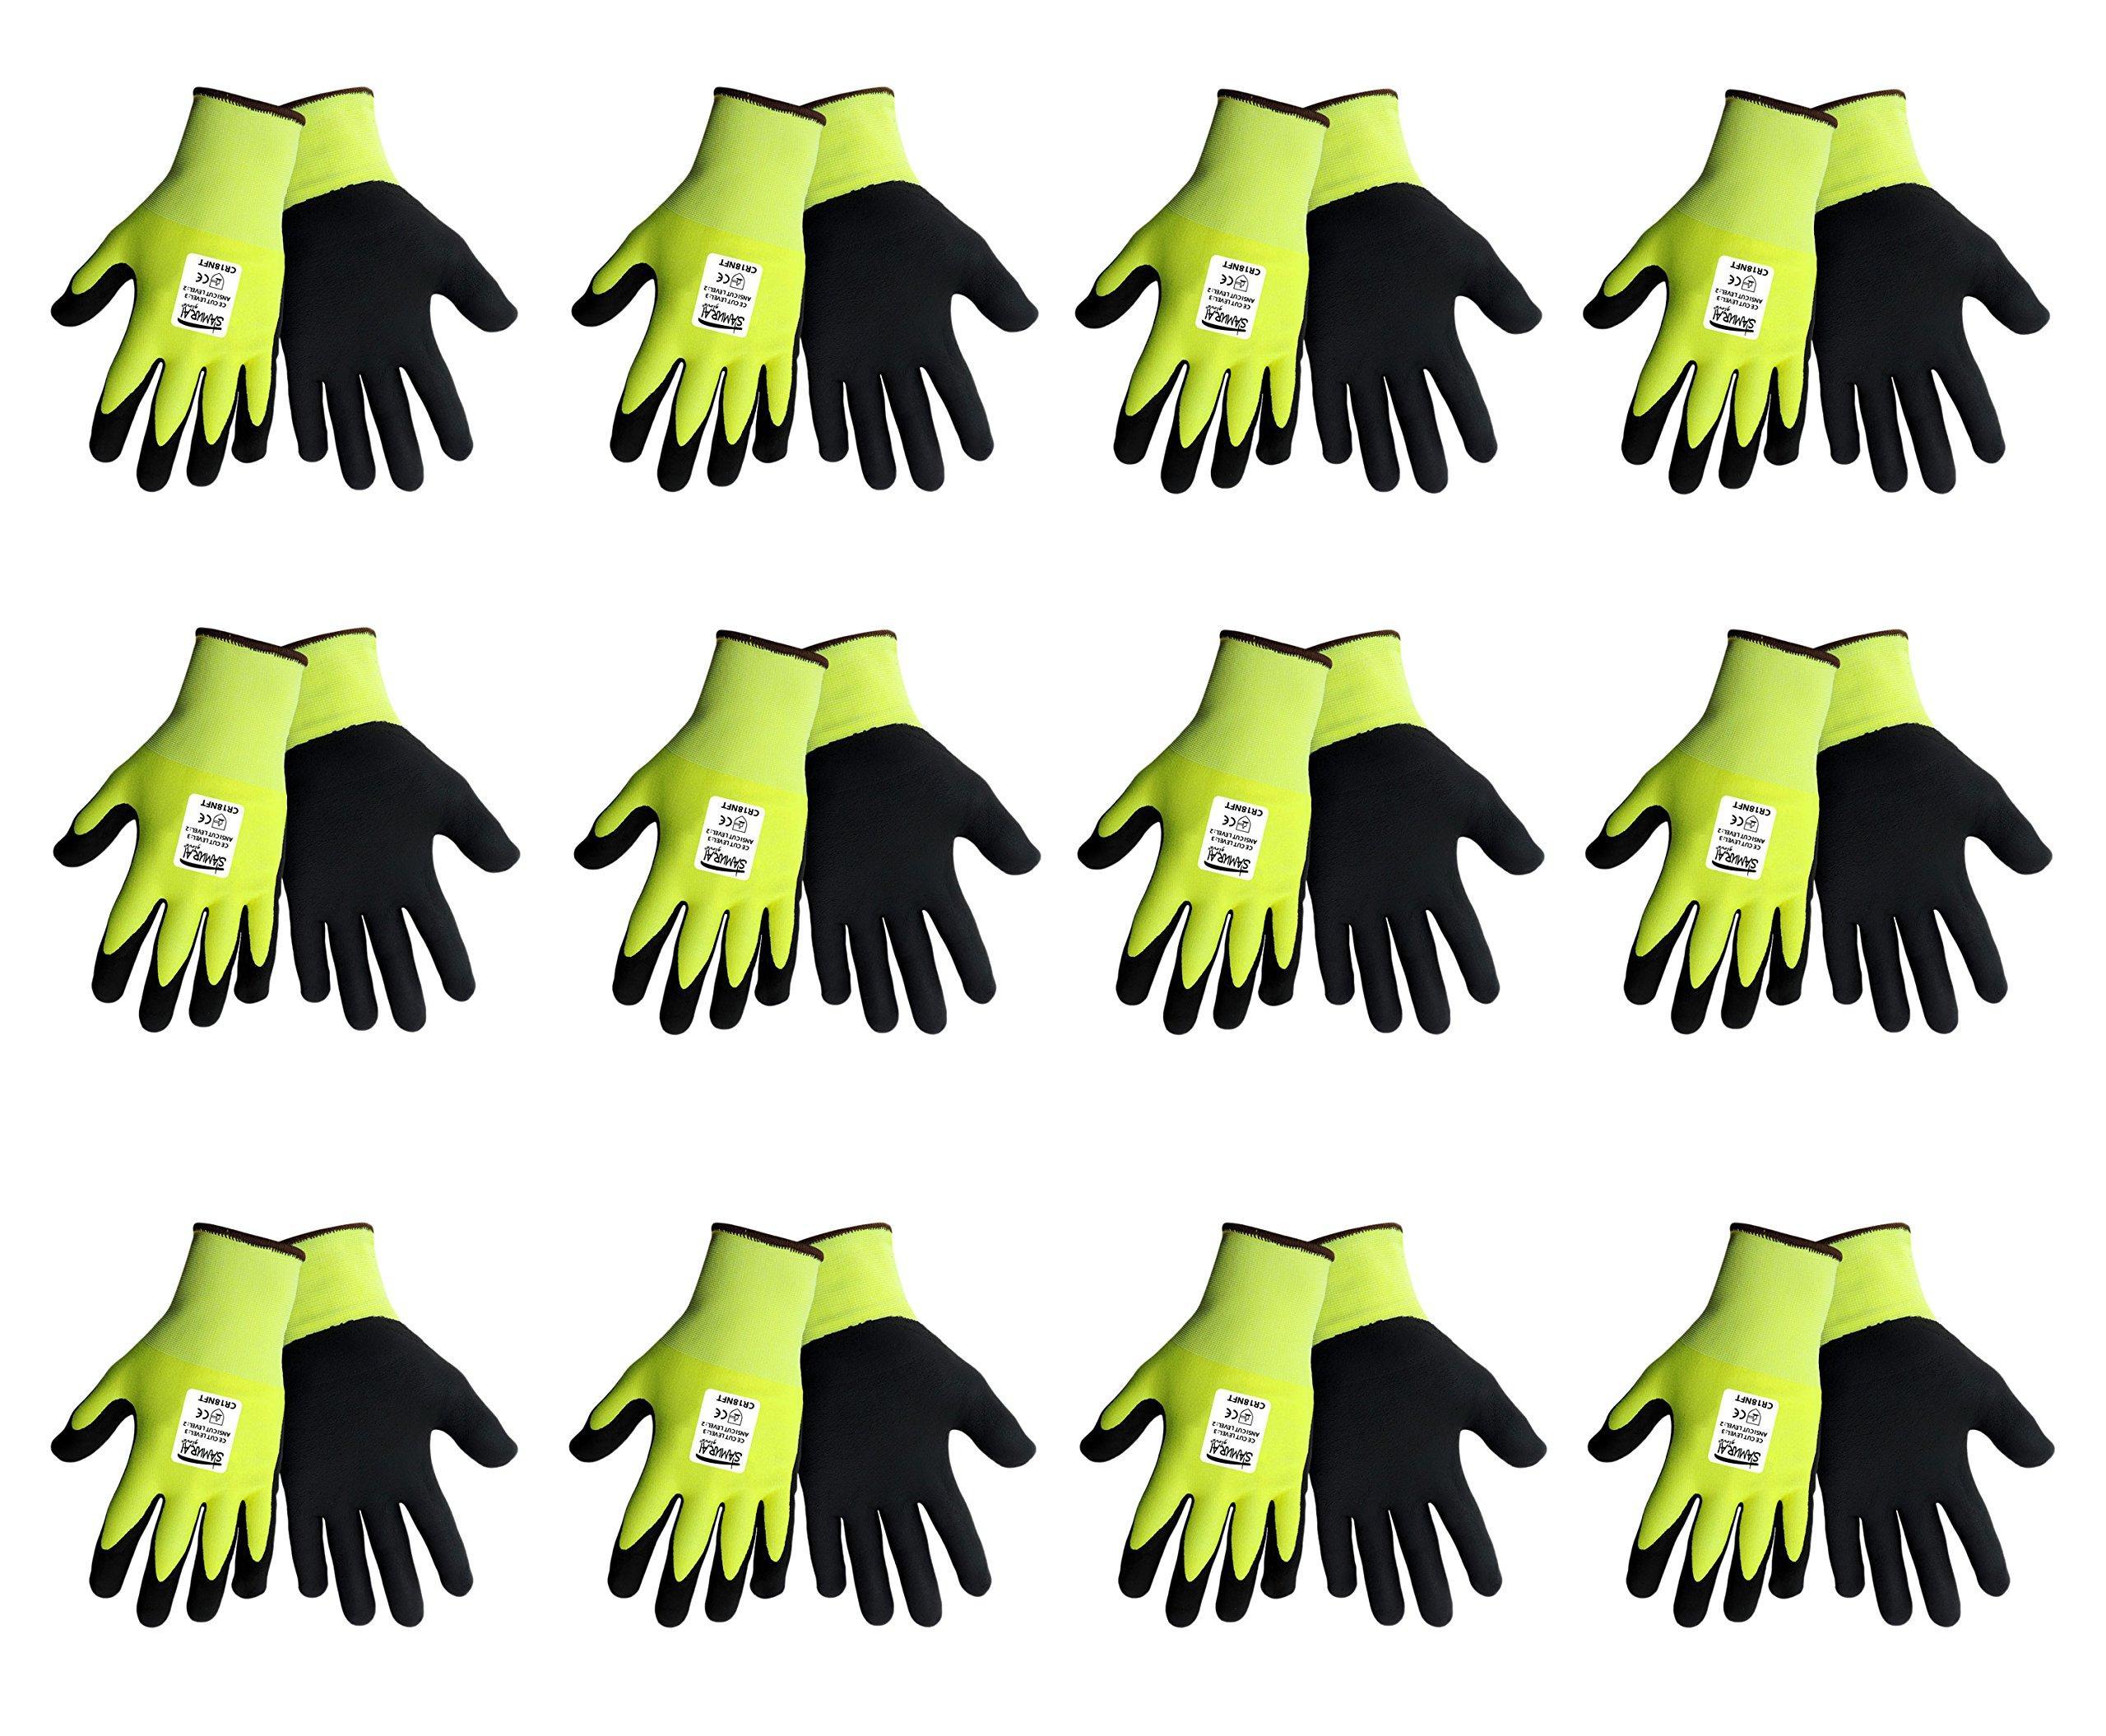 Samurai CR18NFT Hi-Vis Cut Resistant Nitrile Grip Glove, ANSI Cut Level 2, (12 Pair Pack) (Extra Large) by Samurai (Image #1)